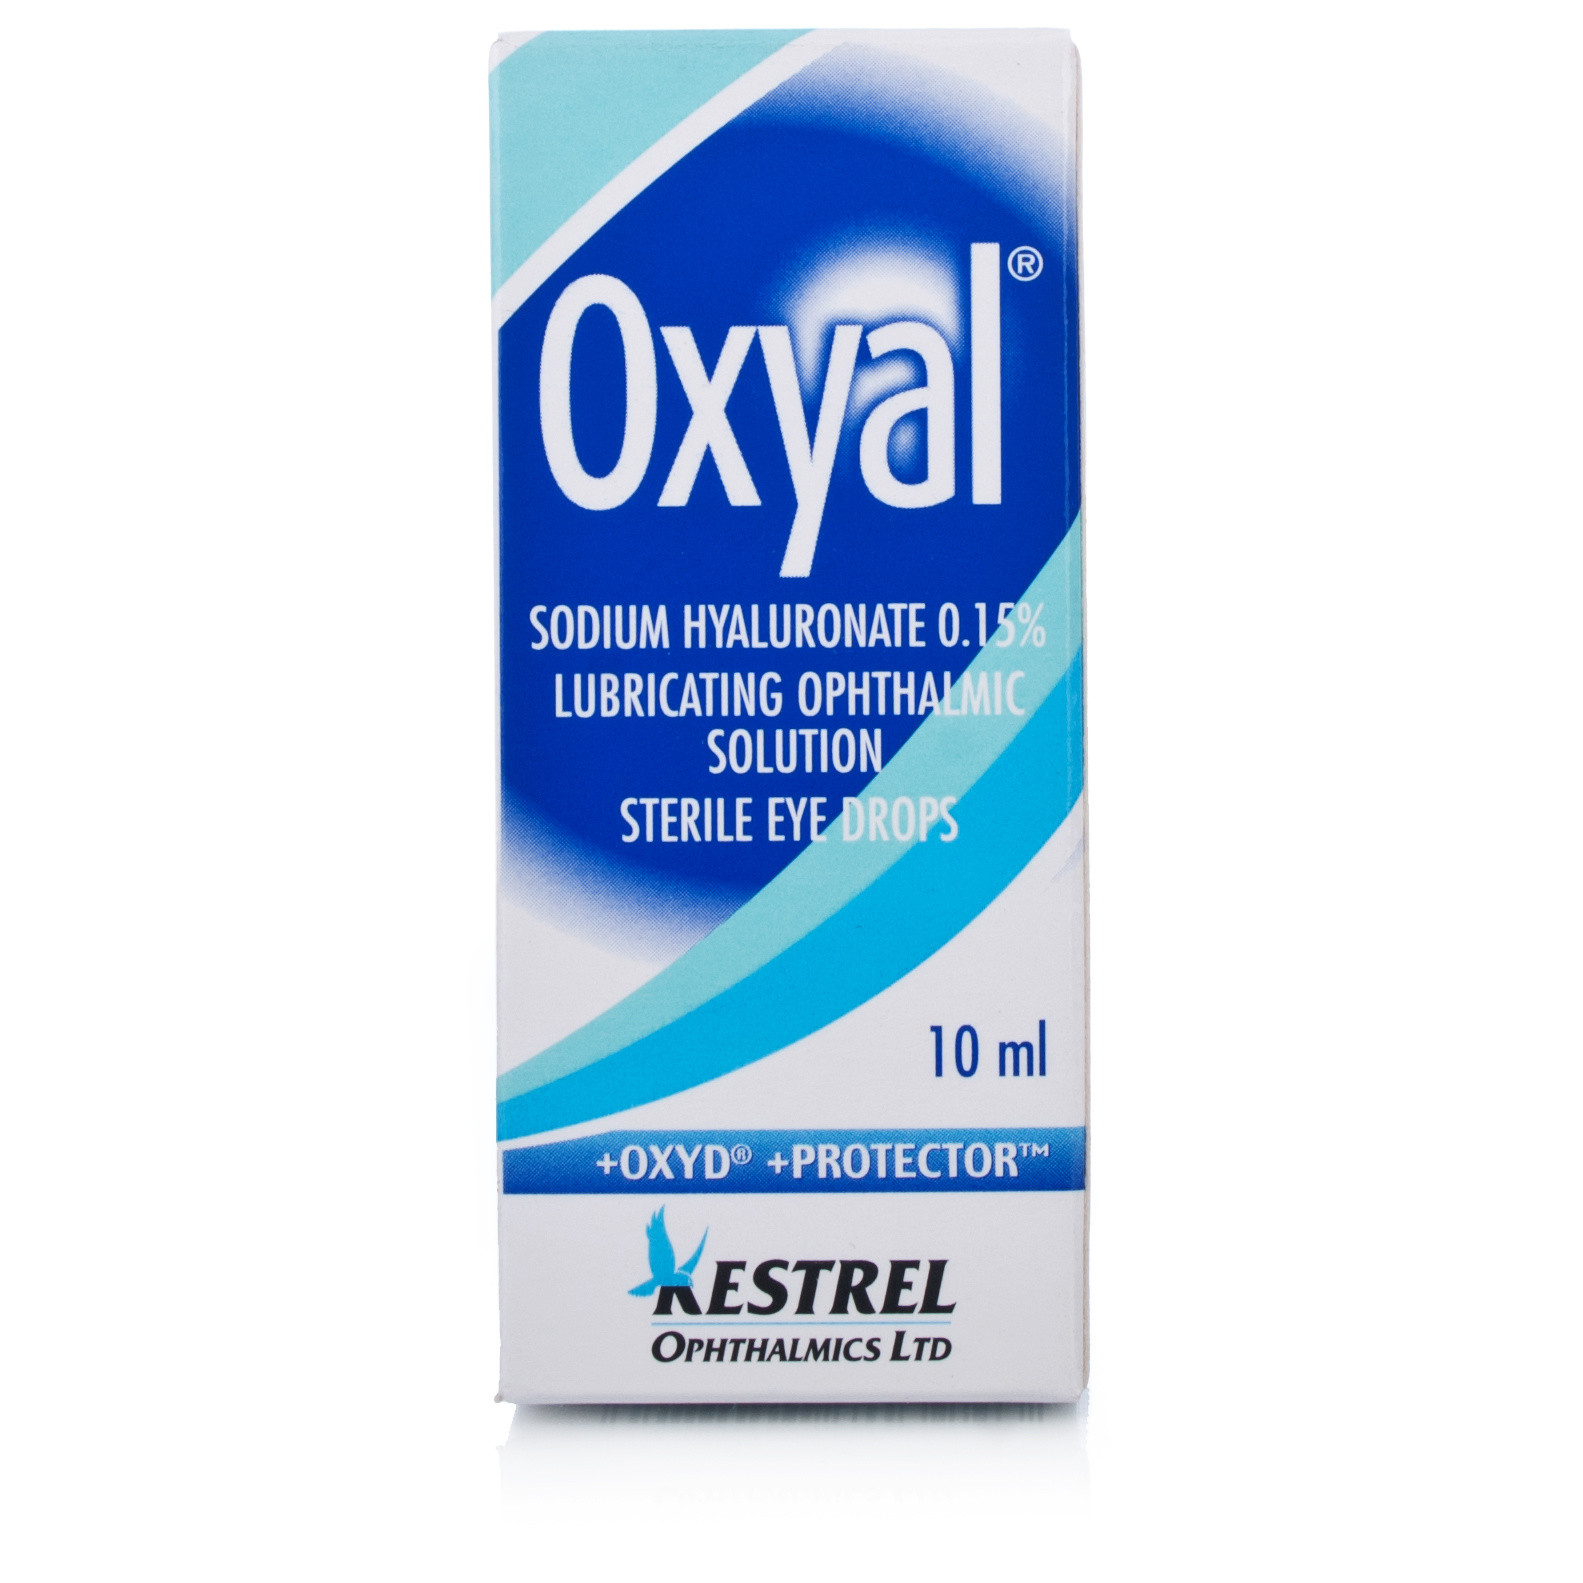 Oxyal Lubrication Eye Drops